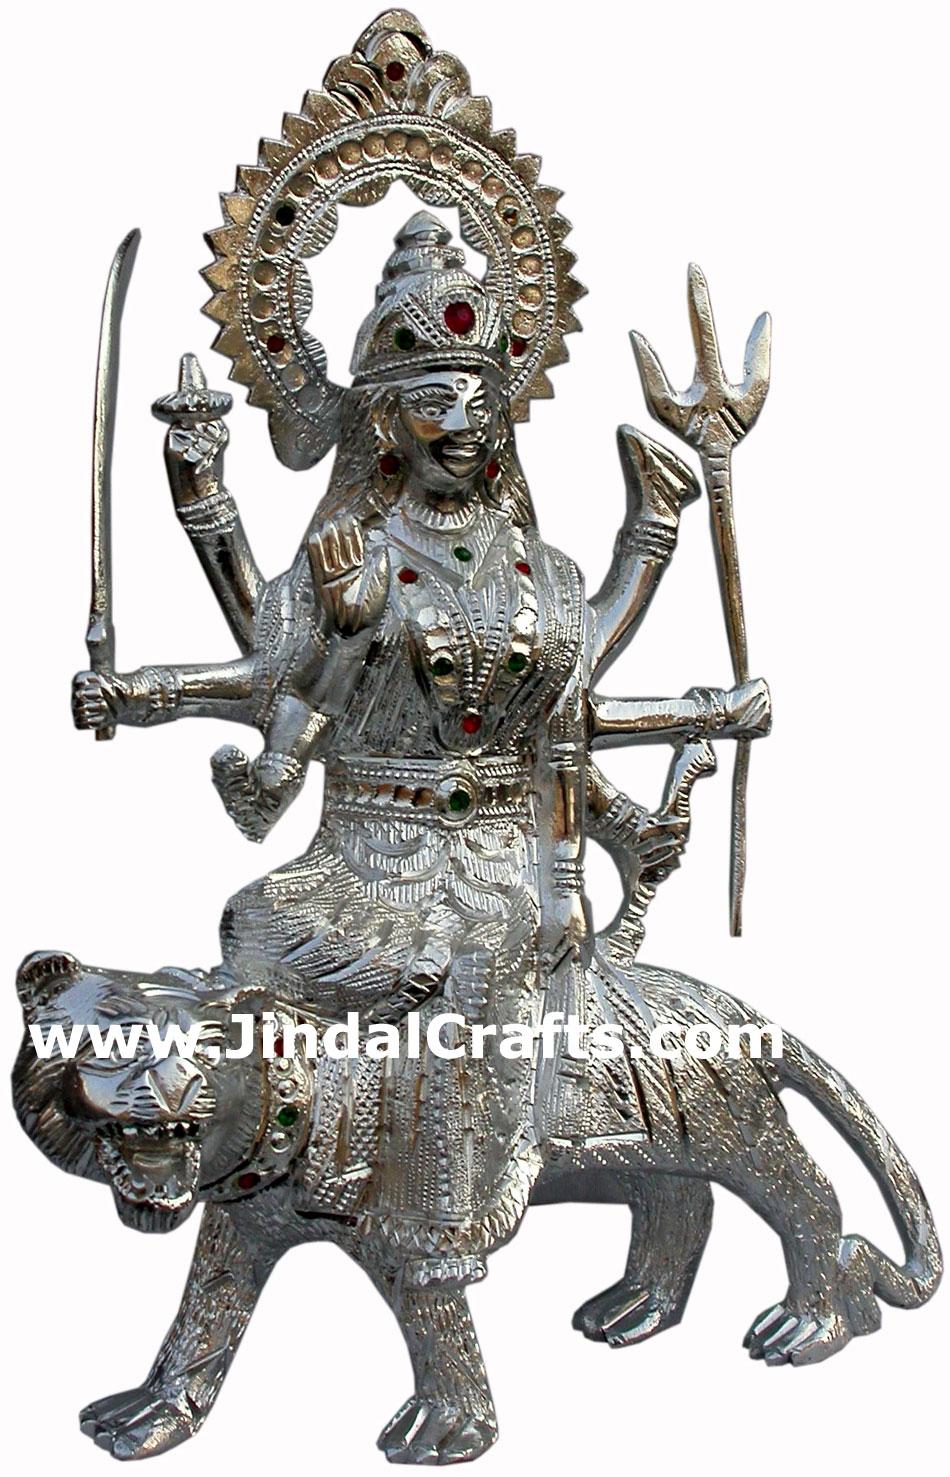 Durga Hand Carved Indian Art Craft Handicraft Home Decor